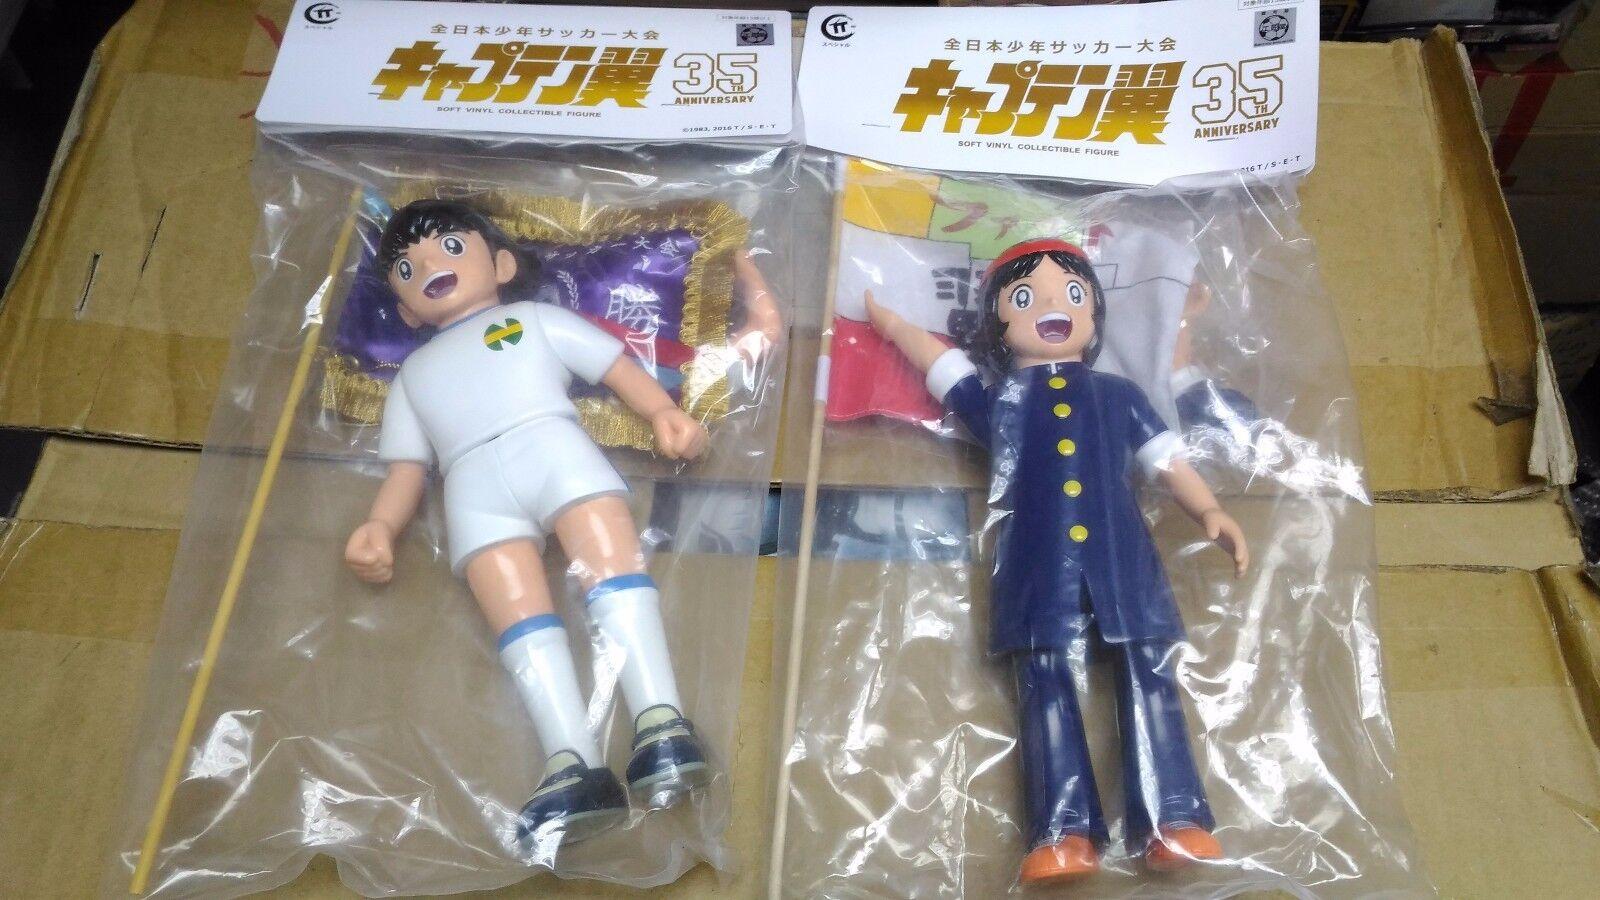 Kou Shou Do Captain Tsubasa Oozora & Sanae Nakazawa 2  Flags Soft Vinyl cifra  il più recente